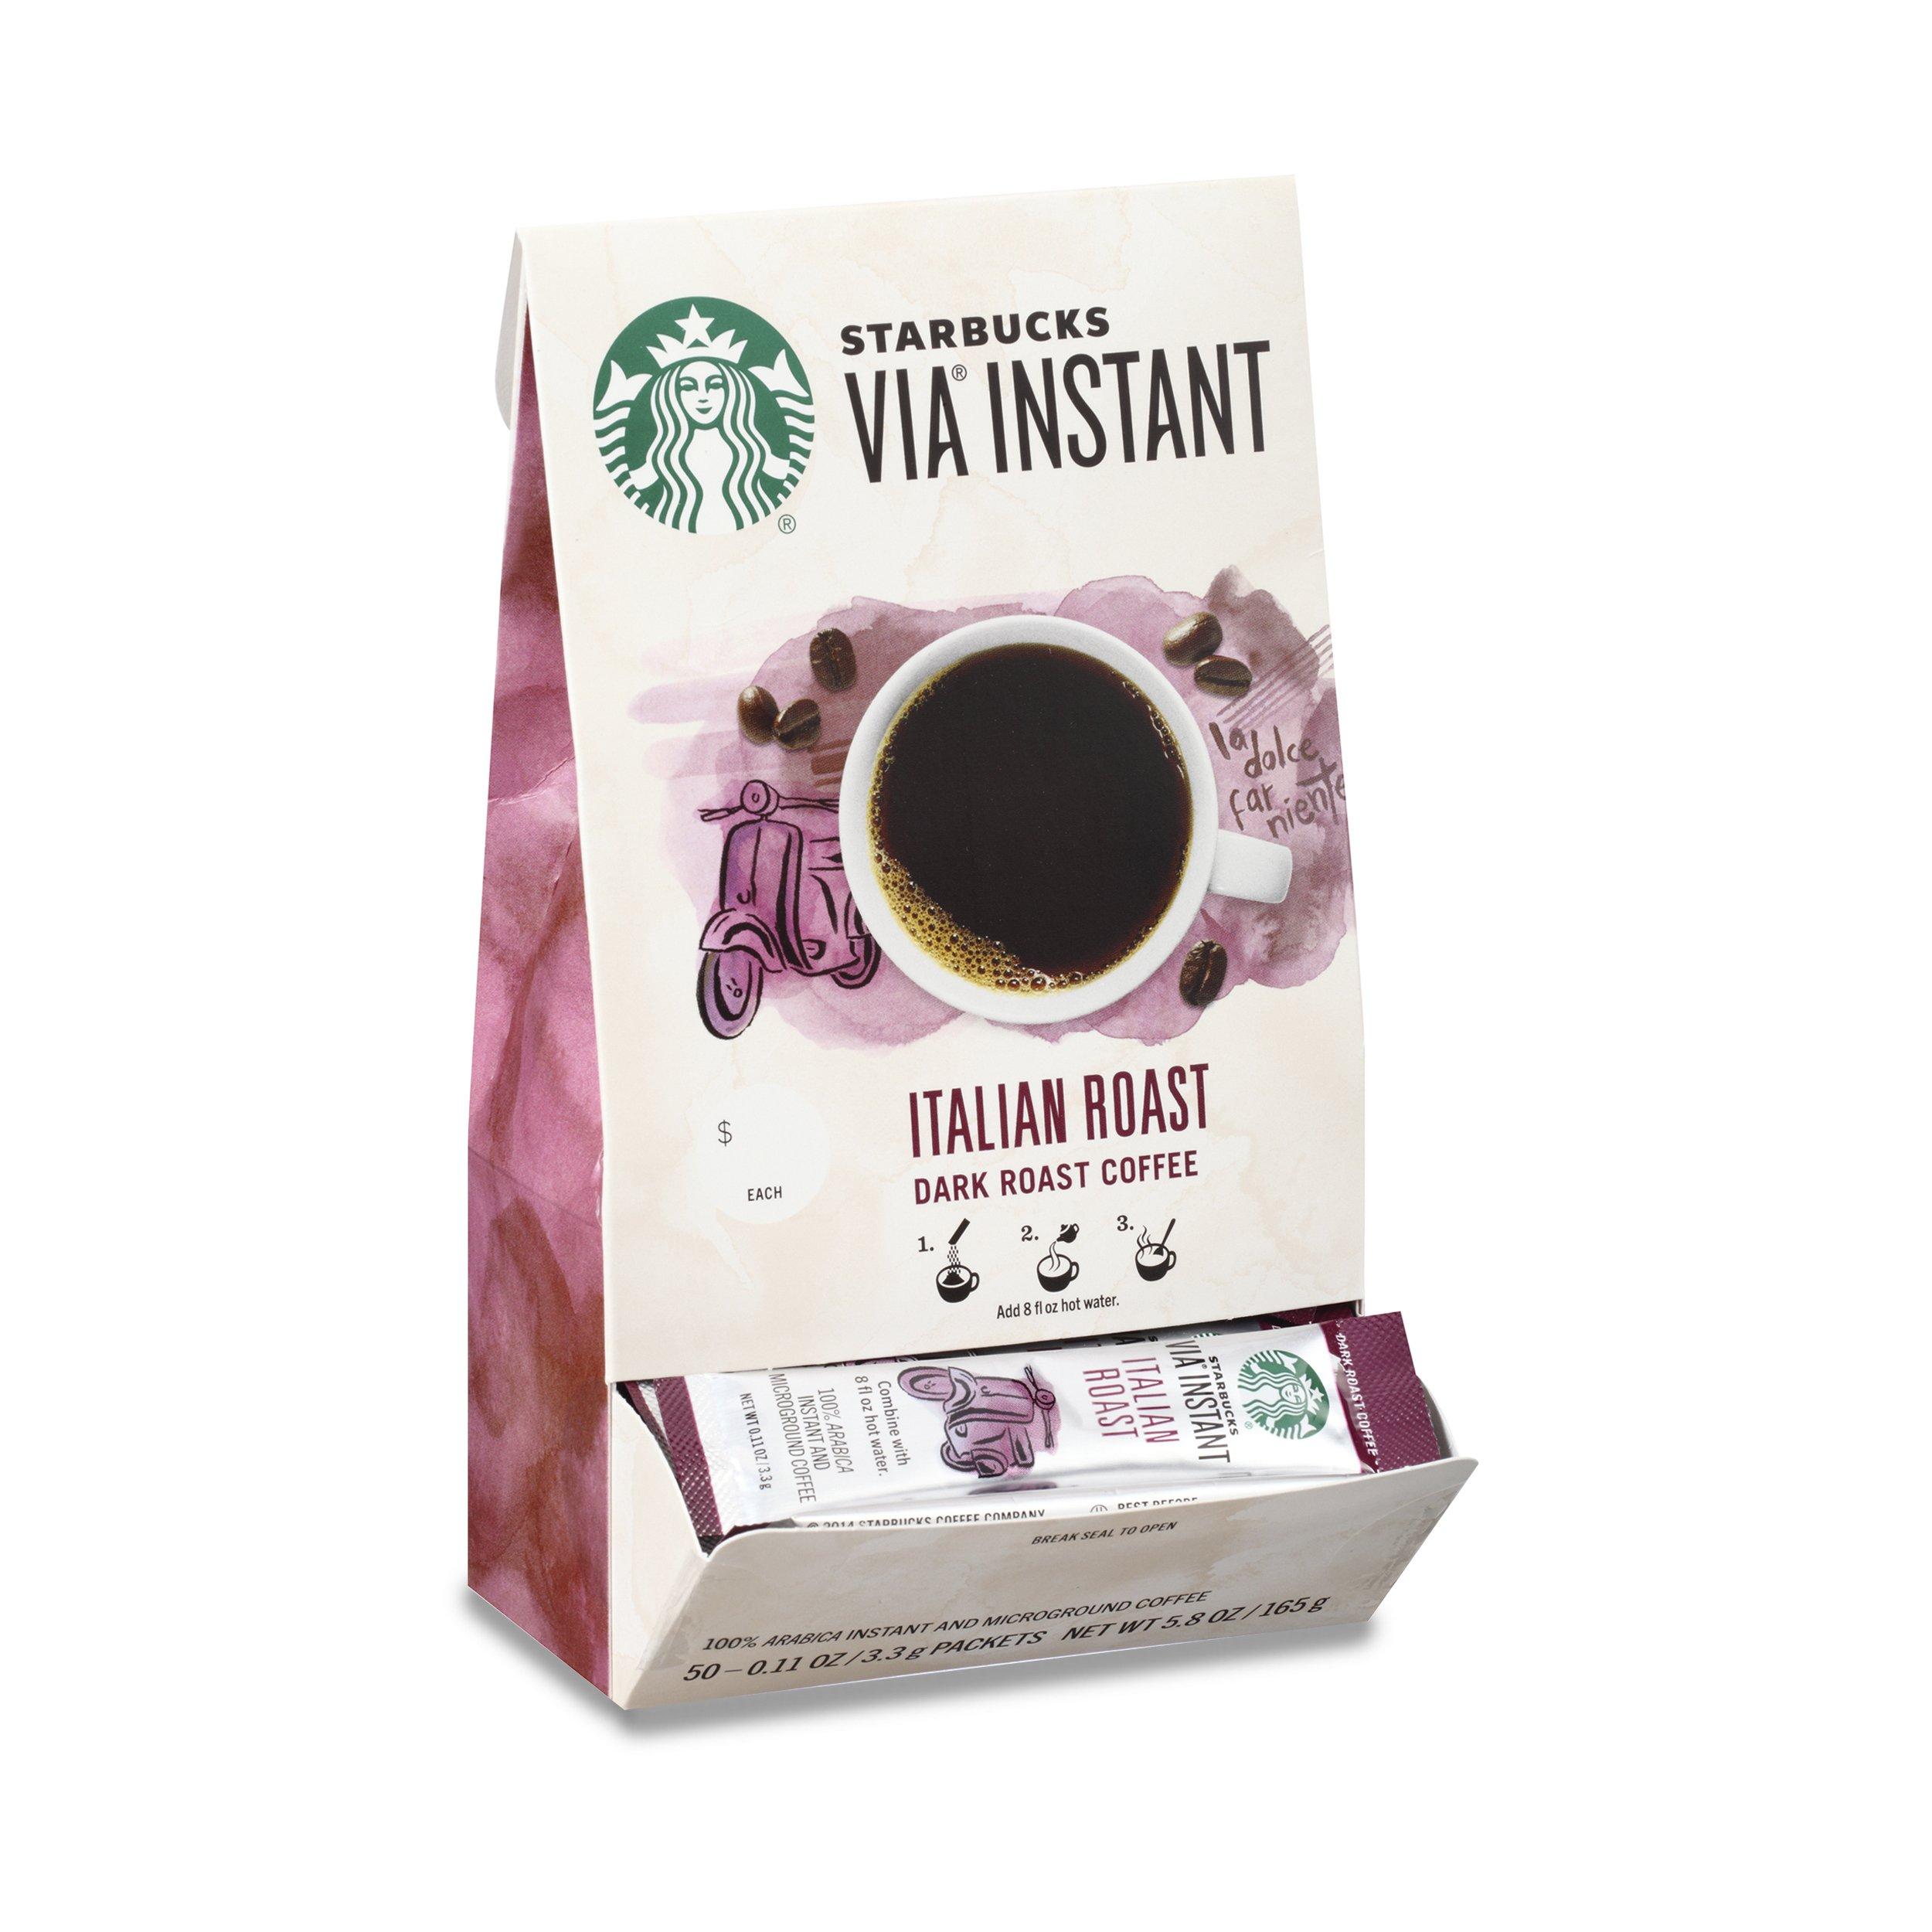 Starbucks VIA Instant Italian Roast Dark Roast Coffee (1 box of 50 packets) by Starbucks